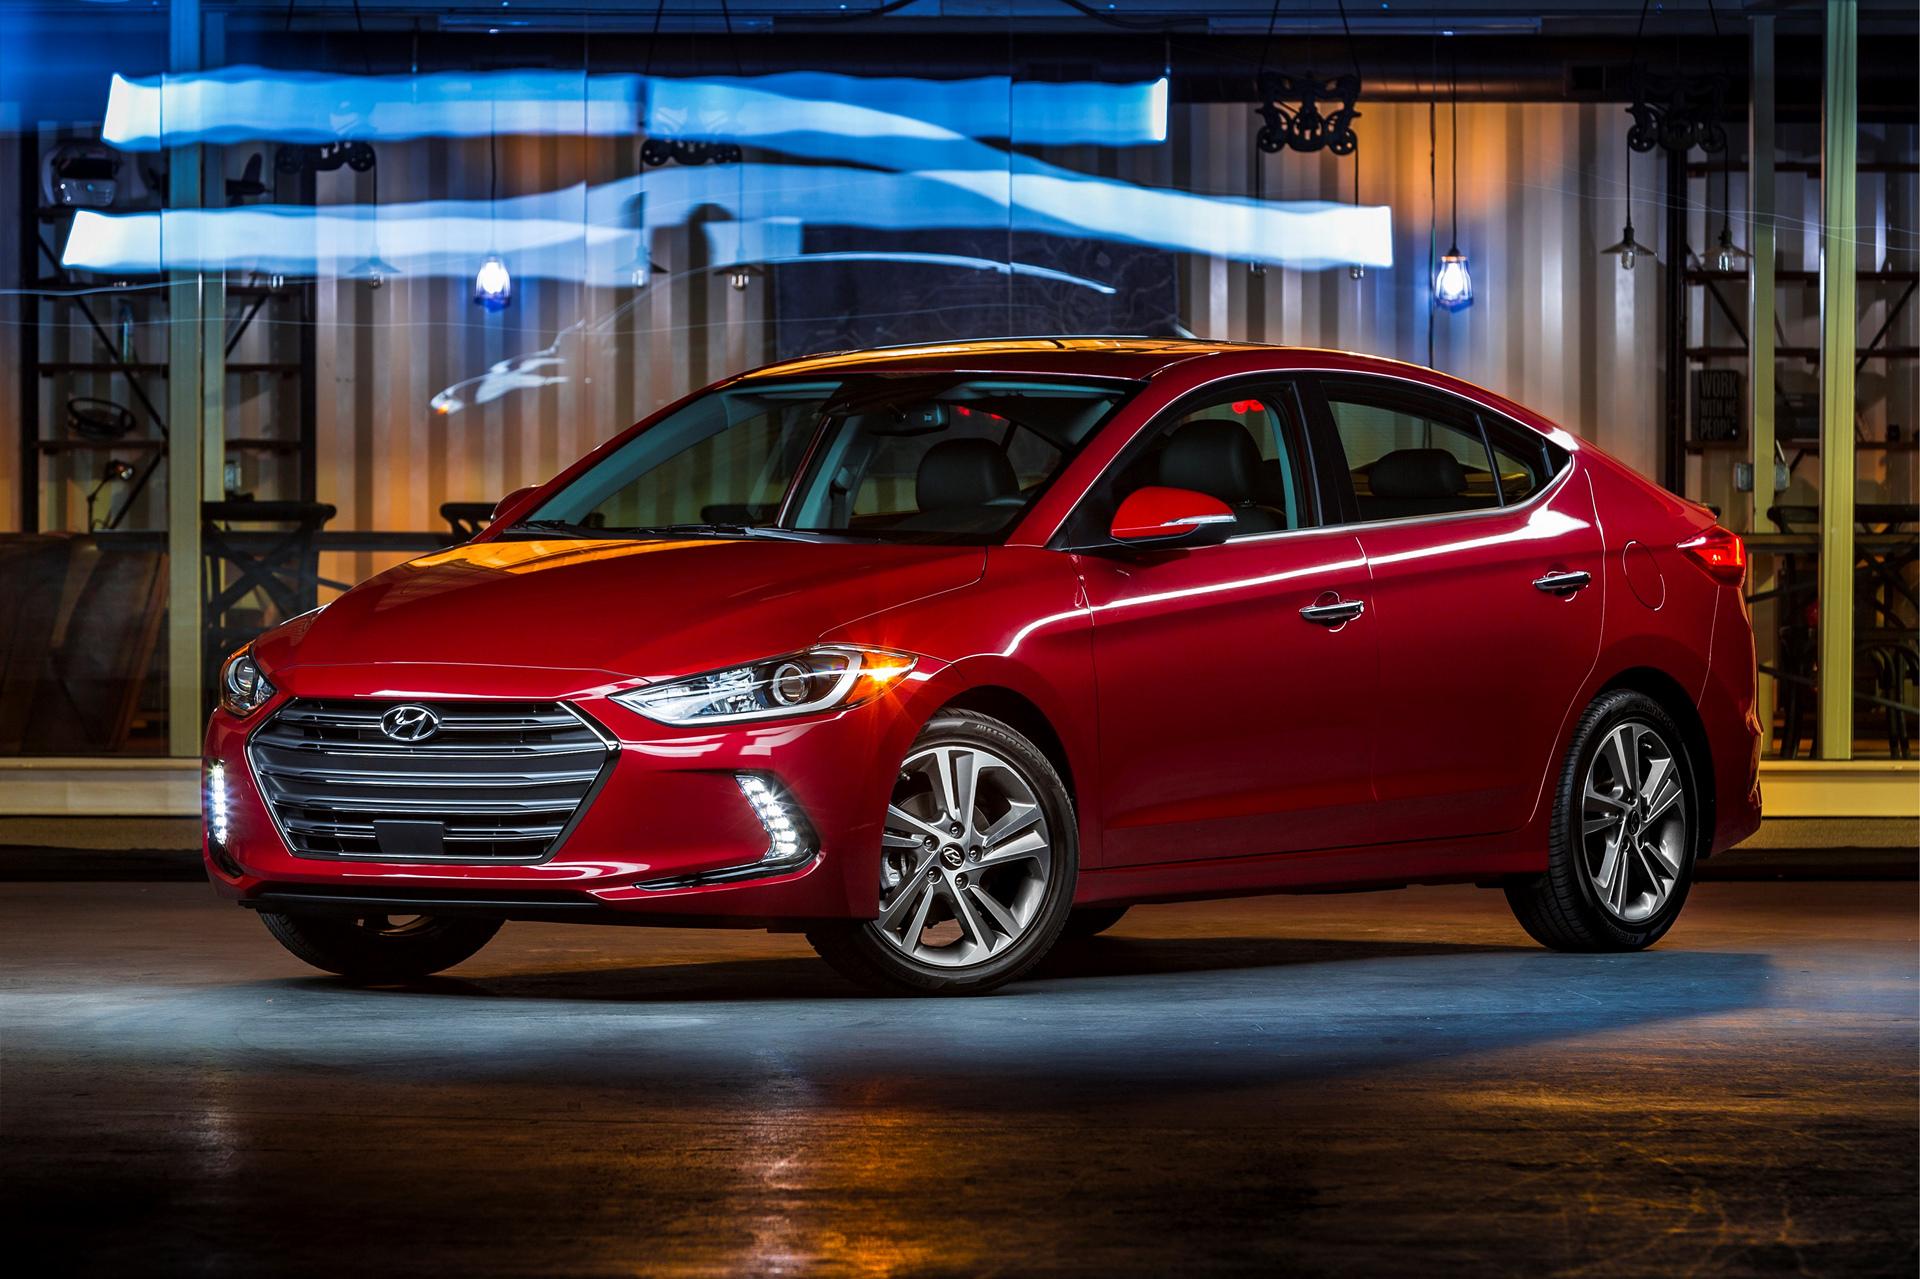 2017 Hyundai Elantra © Hyundai Motor Company